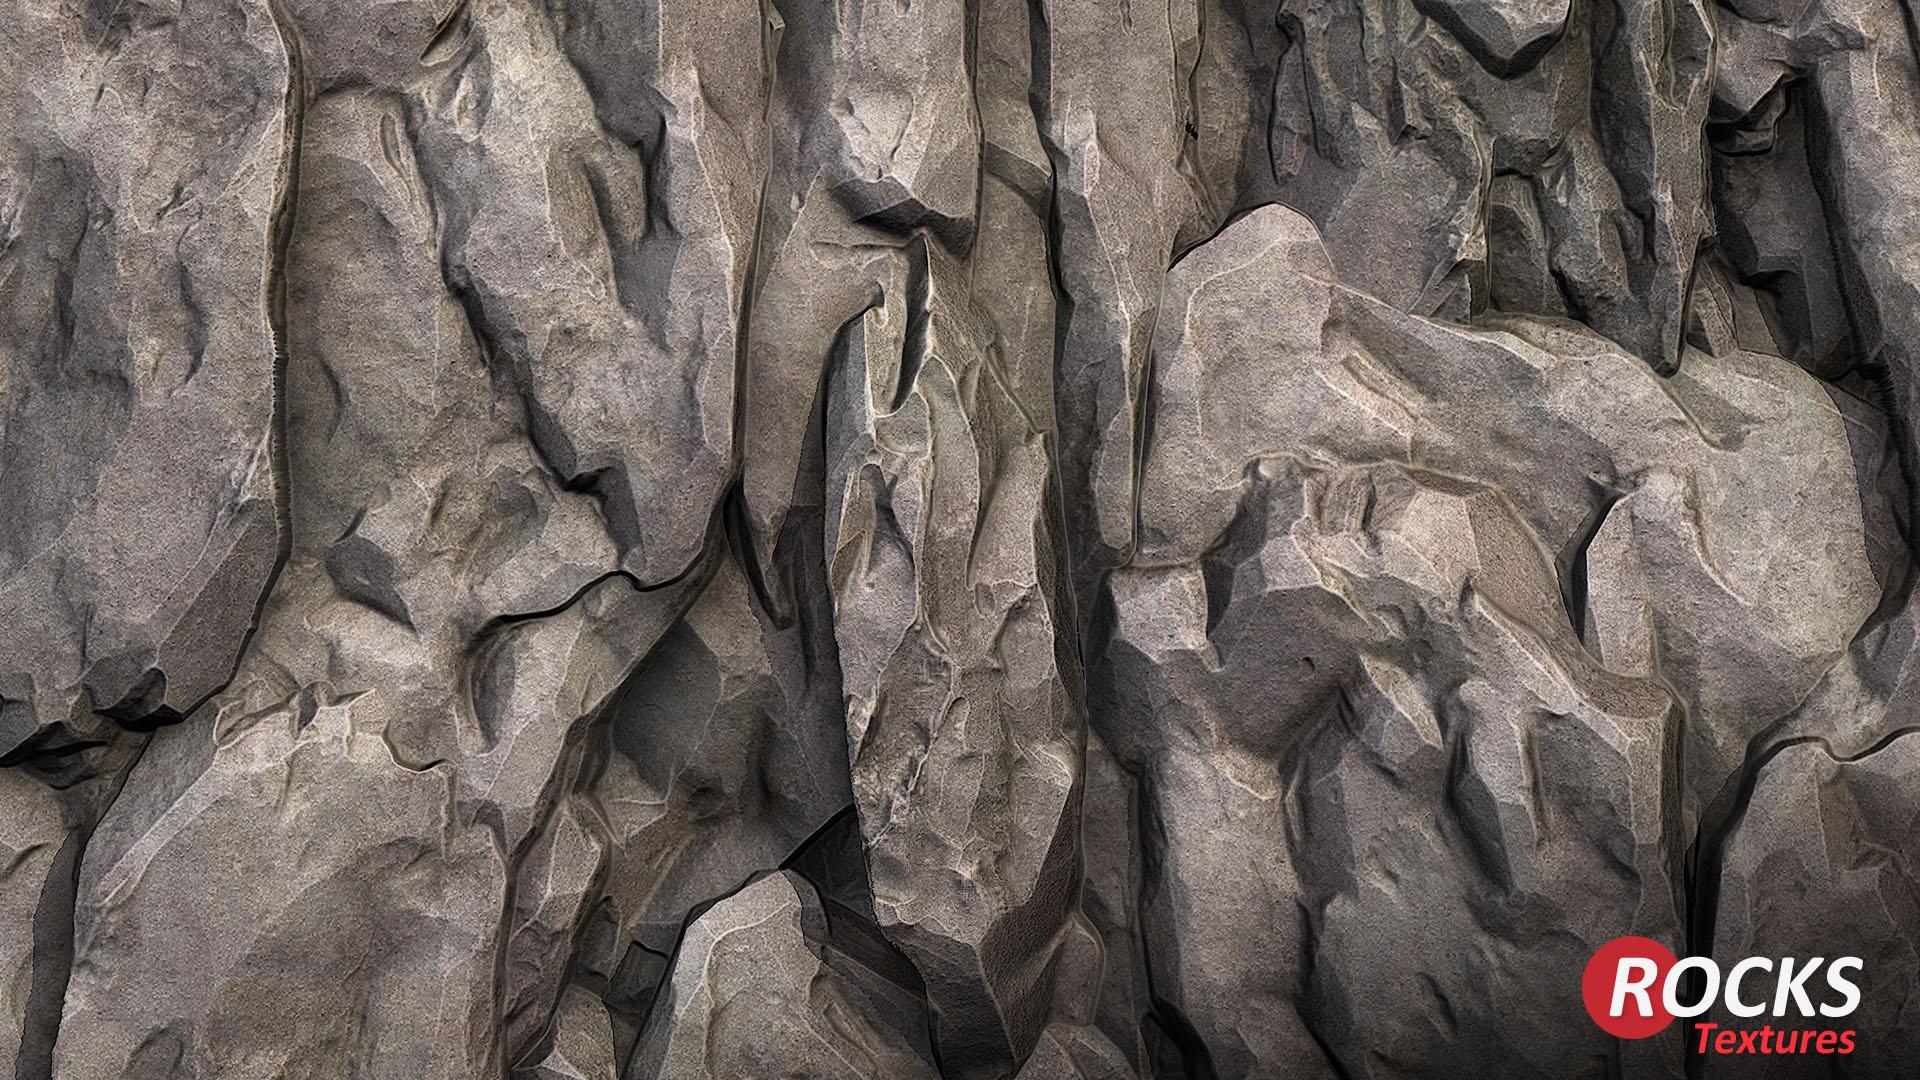 rock_stone_sculpted_textures_03.jpg